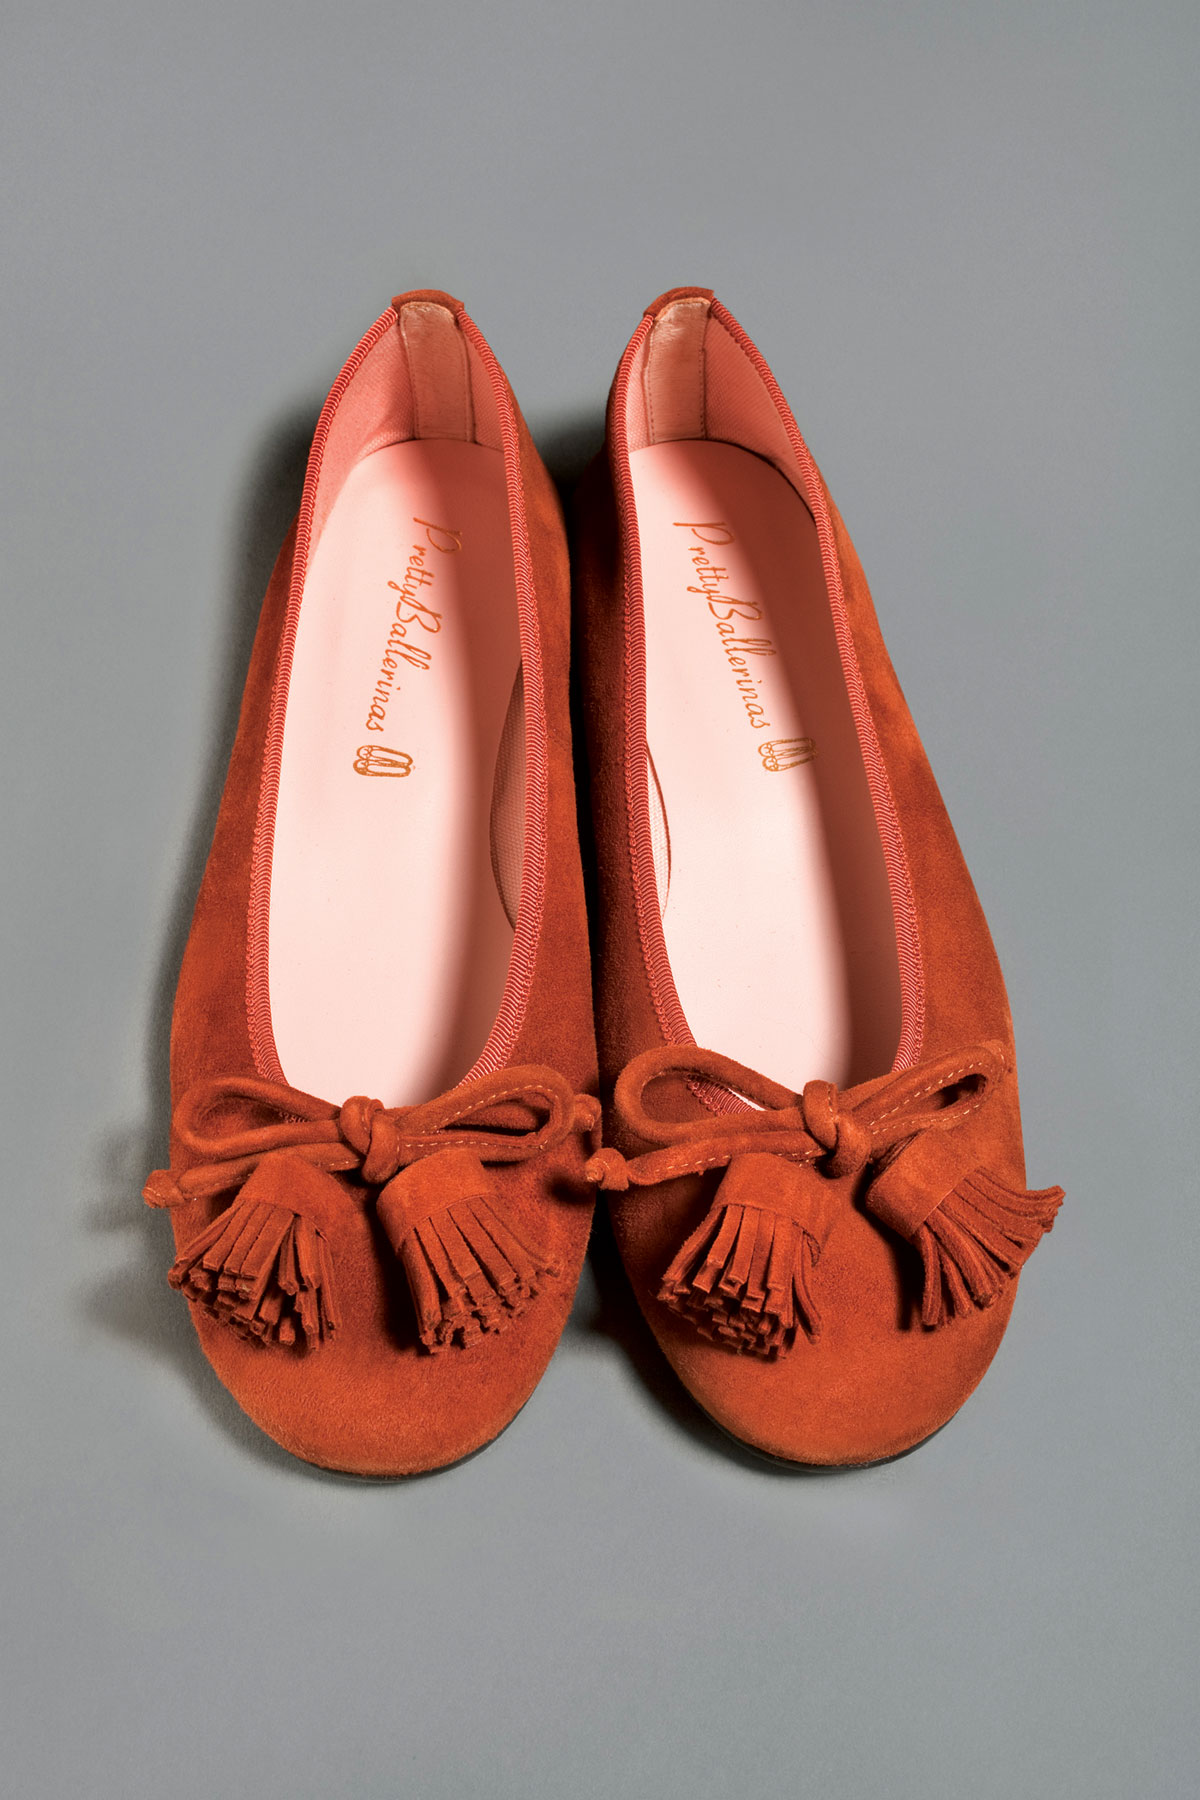 m08-accessoires-ballerines-ogilvy